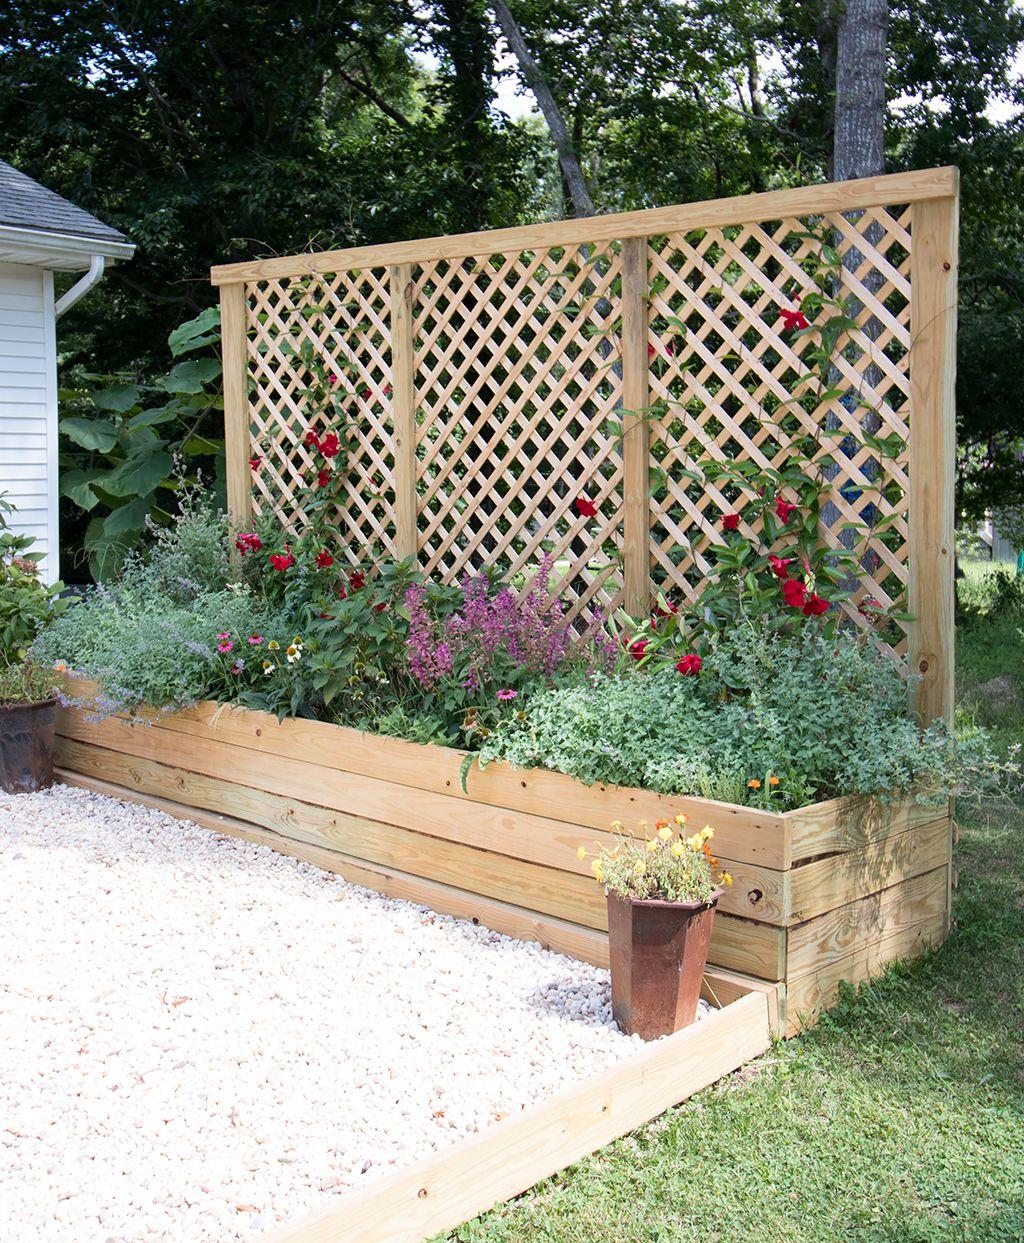 Privacy Screen Planter Diy Gina Michele Diy Garden Bed Raised Garden Beds Diy Diy Raised Garden